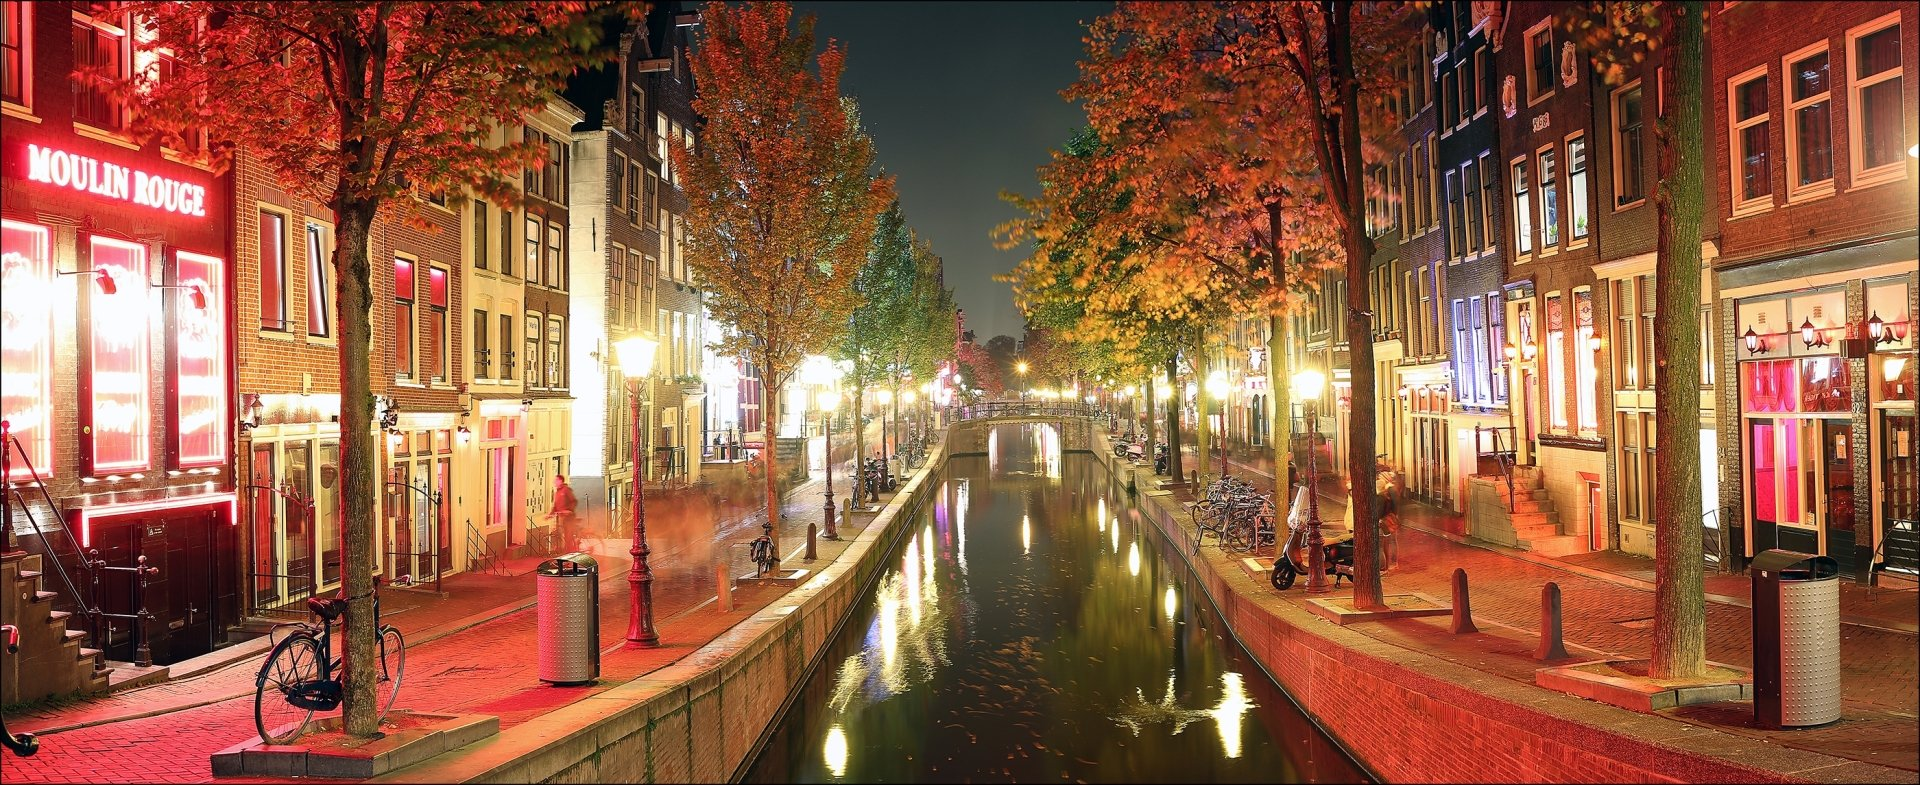 Windows 10 Wallpapers Hd Fall Autumn Night In Amsterdam Fondo De Pantalla Hd Fondo De